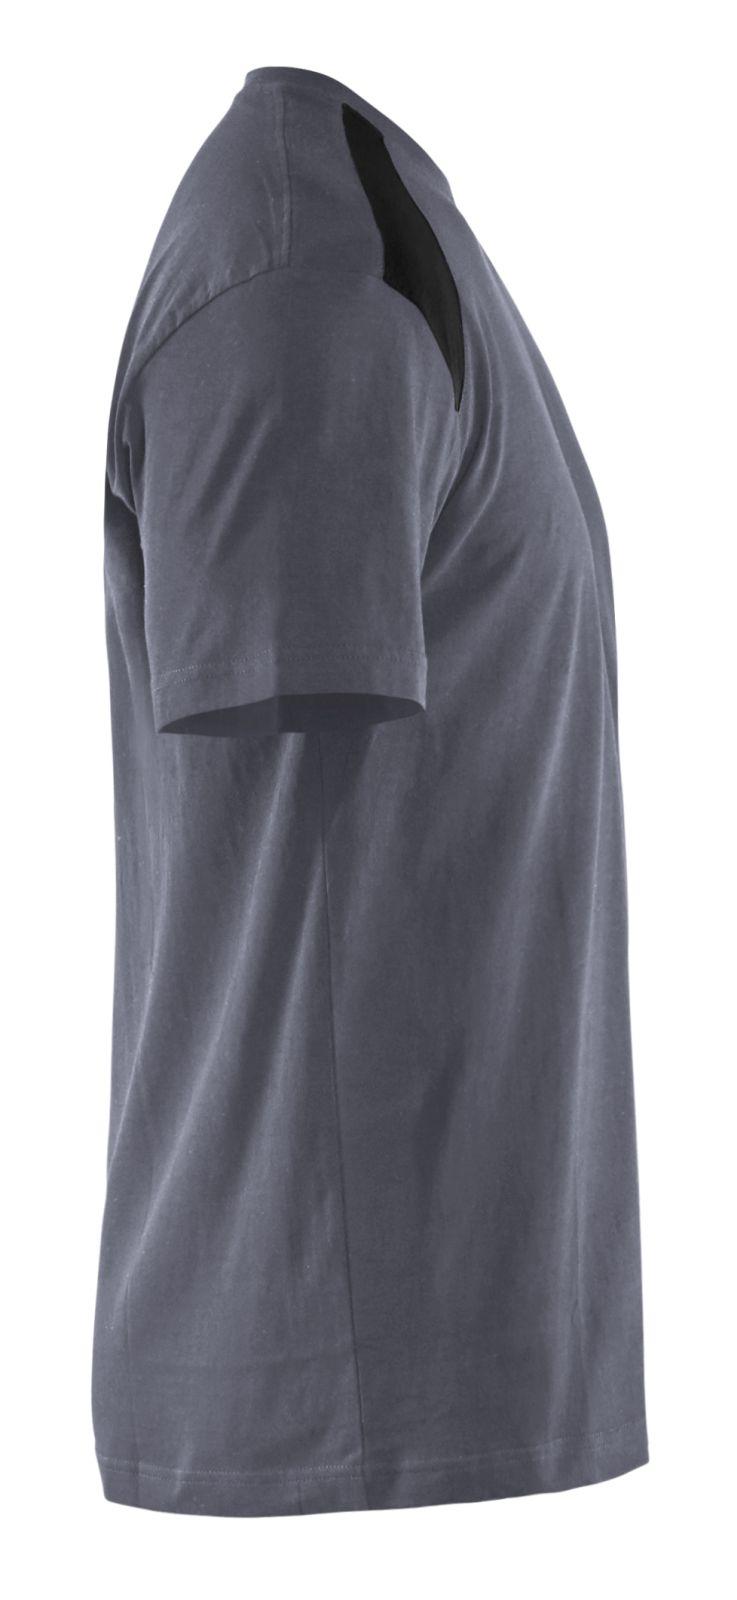 Blaklader T-shirts 33791042 grijs-zwart(9499)